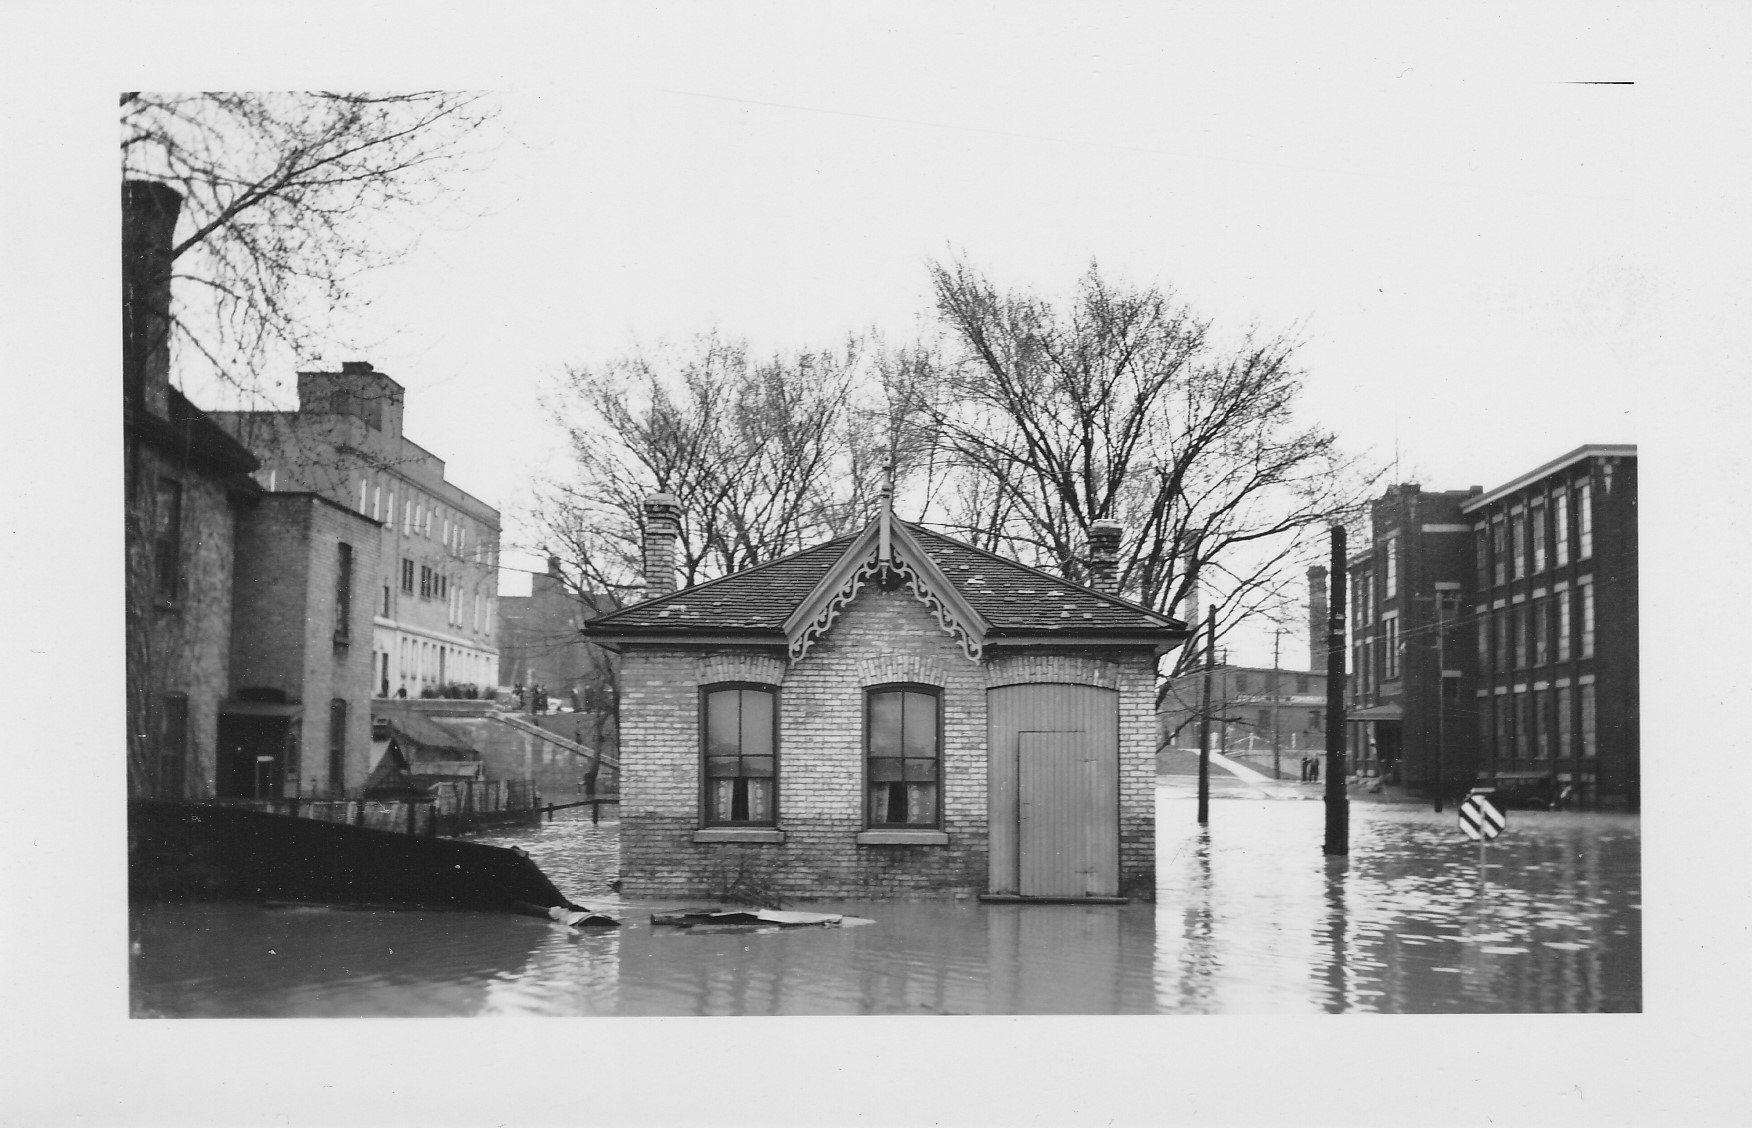 Hope the 1stHussarsMuseum has flood insurance? Photo of